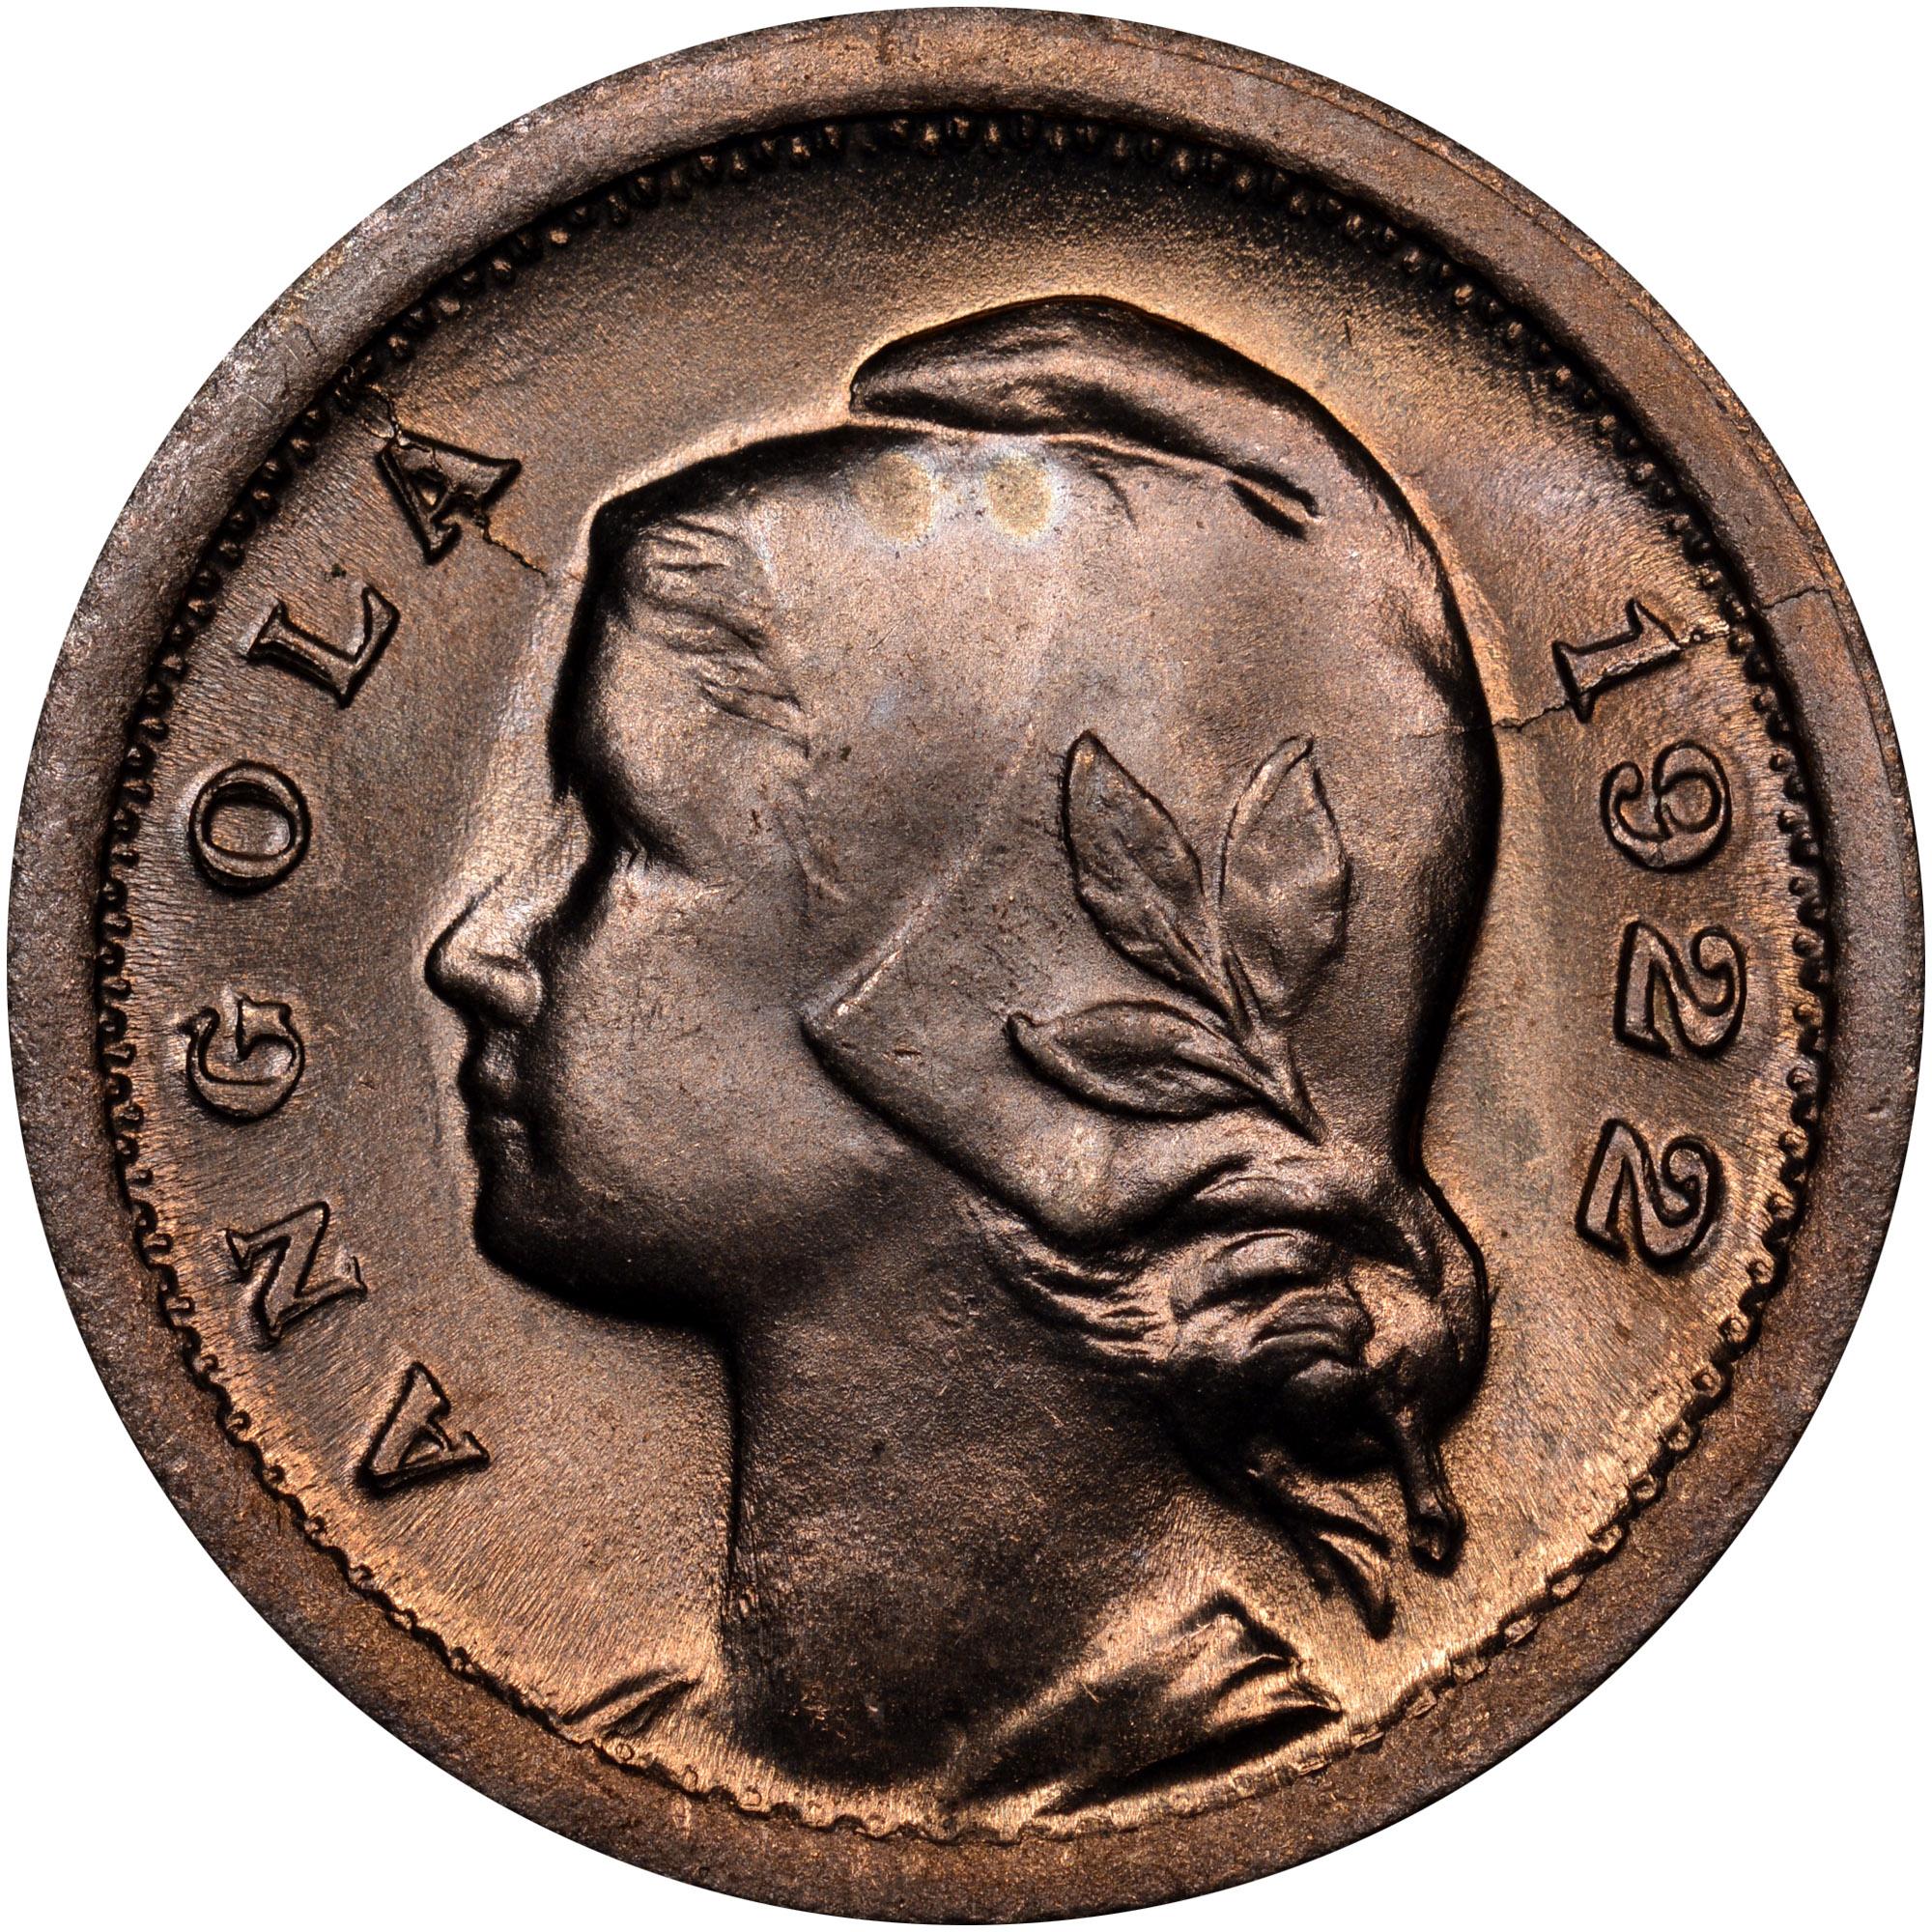 1921-1923 Angola 10 Centavos reverse